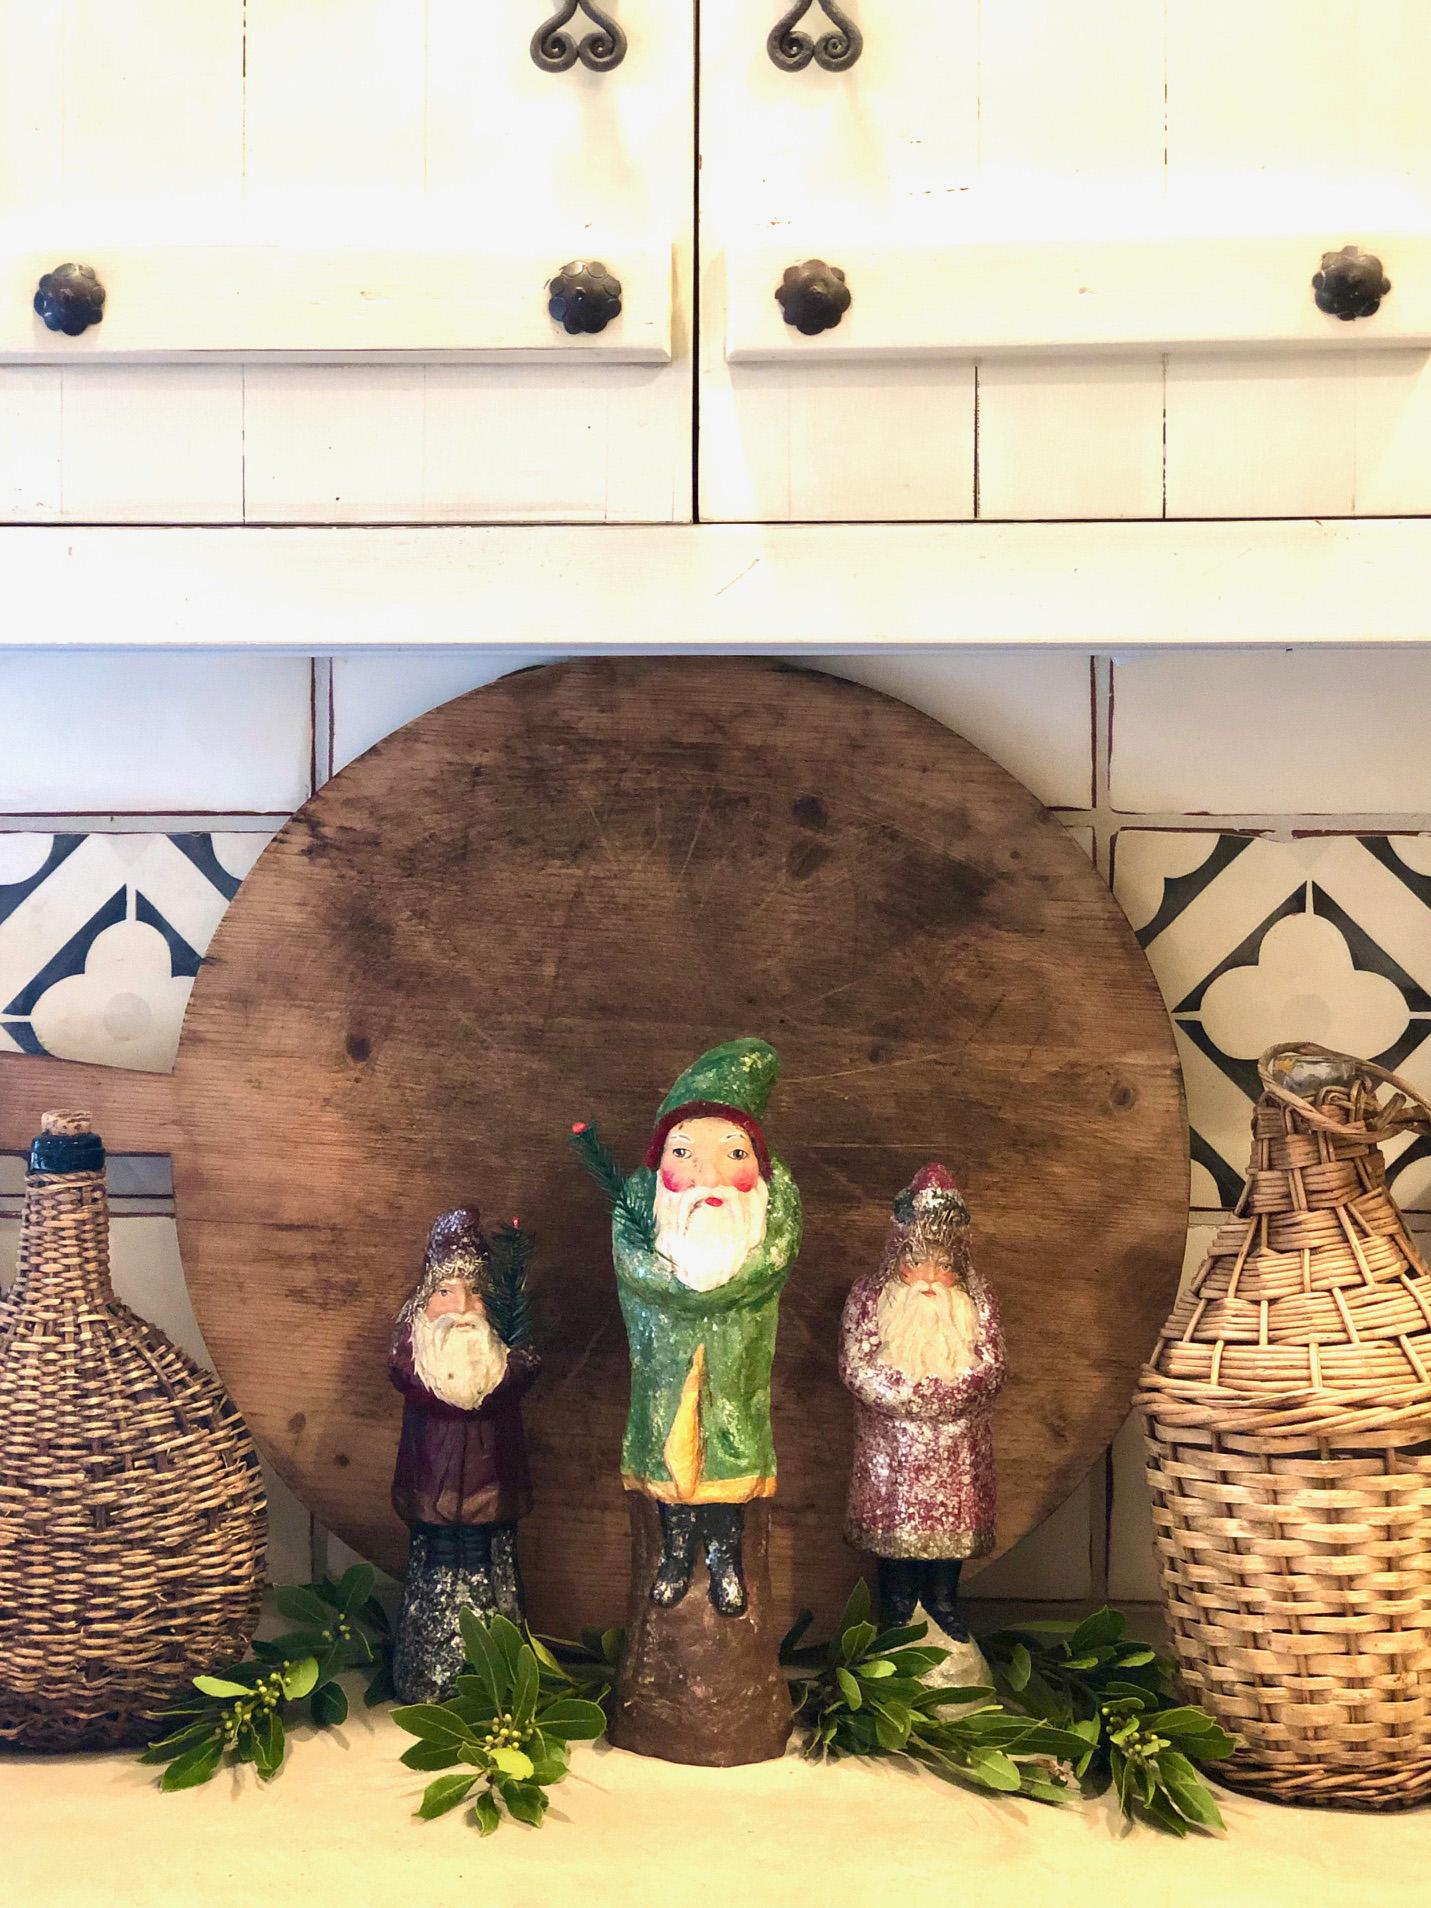 Belsnickels in Cindy Hattersley's kitchen